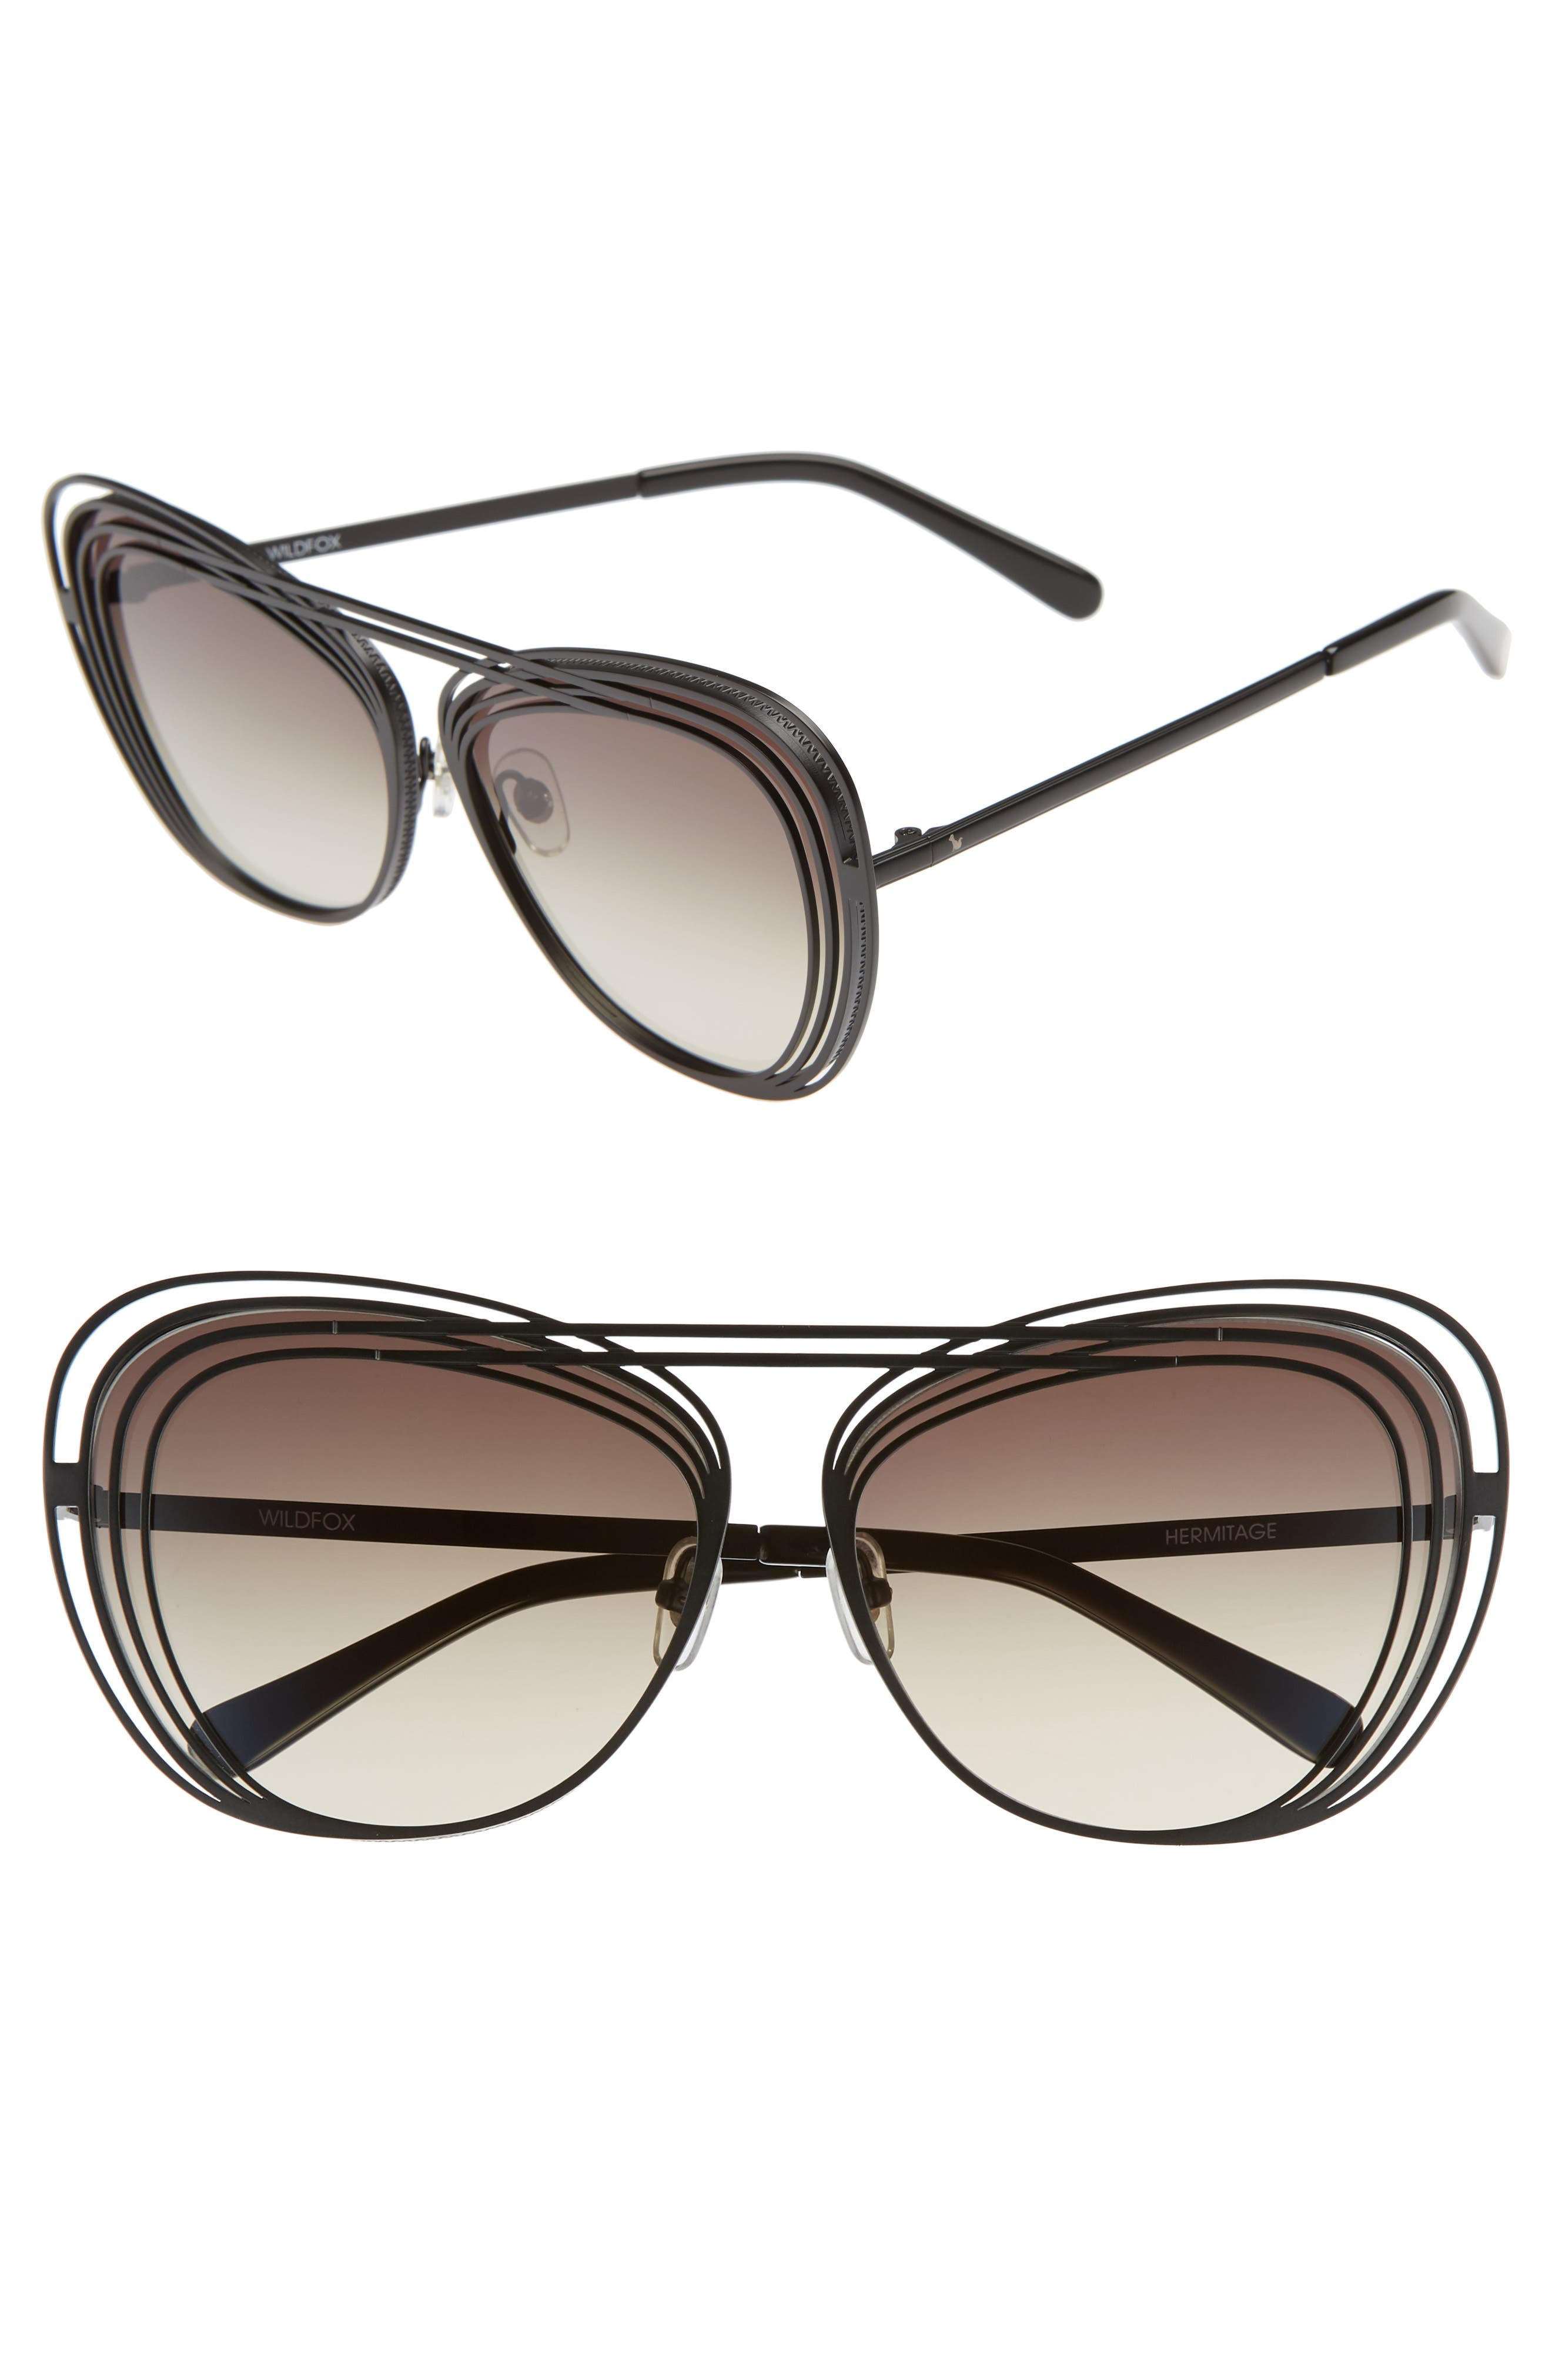 Hermitage 61mm Cat Eye Sunglasses,                         Main,                         color, MATTE BLACK/ GREY GRADIENT